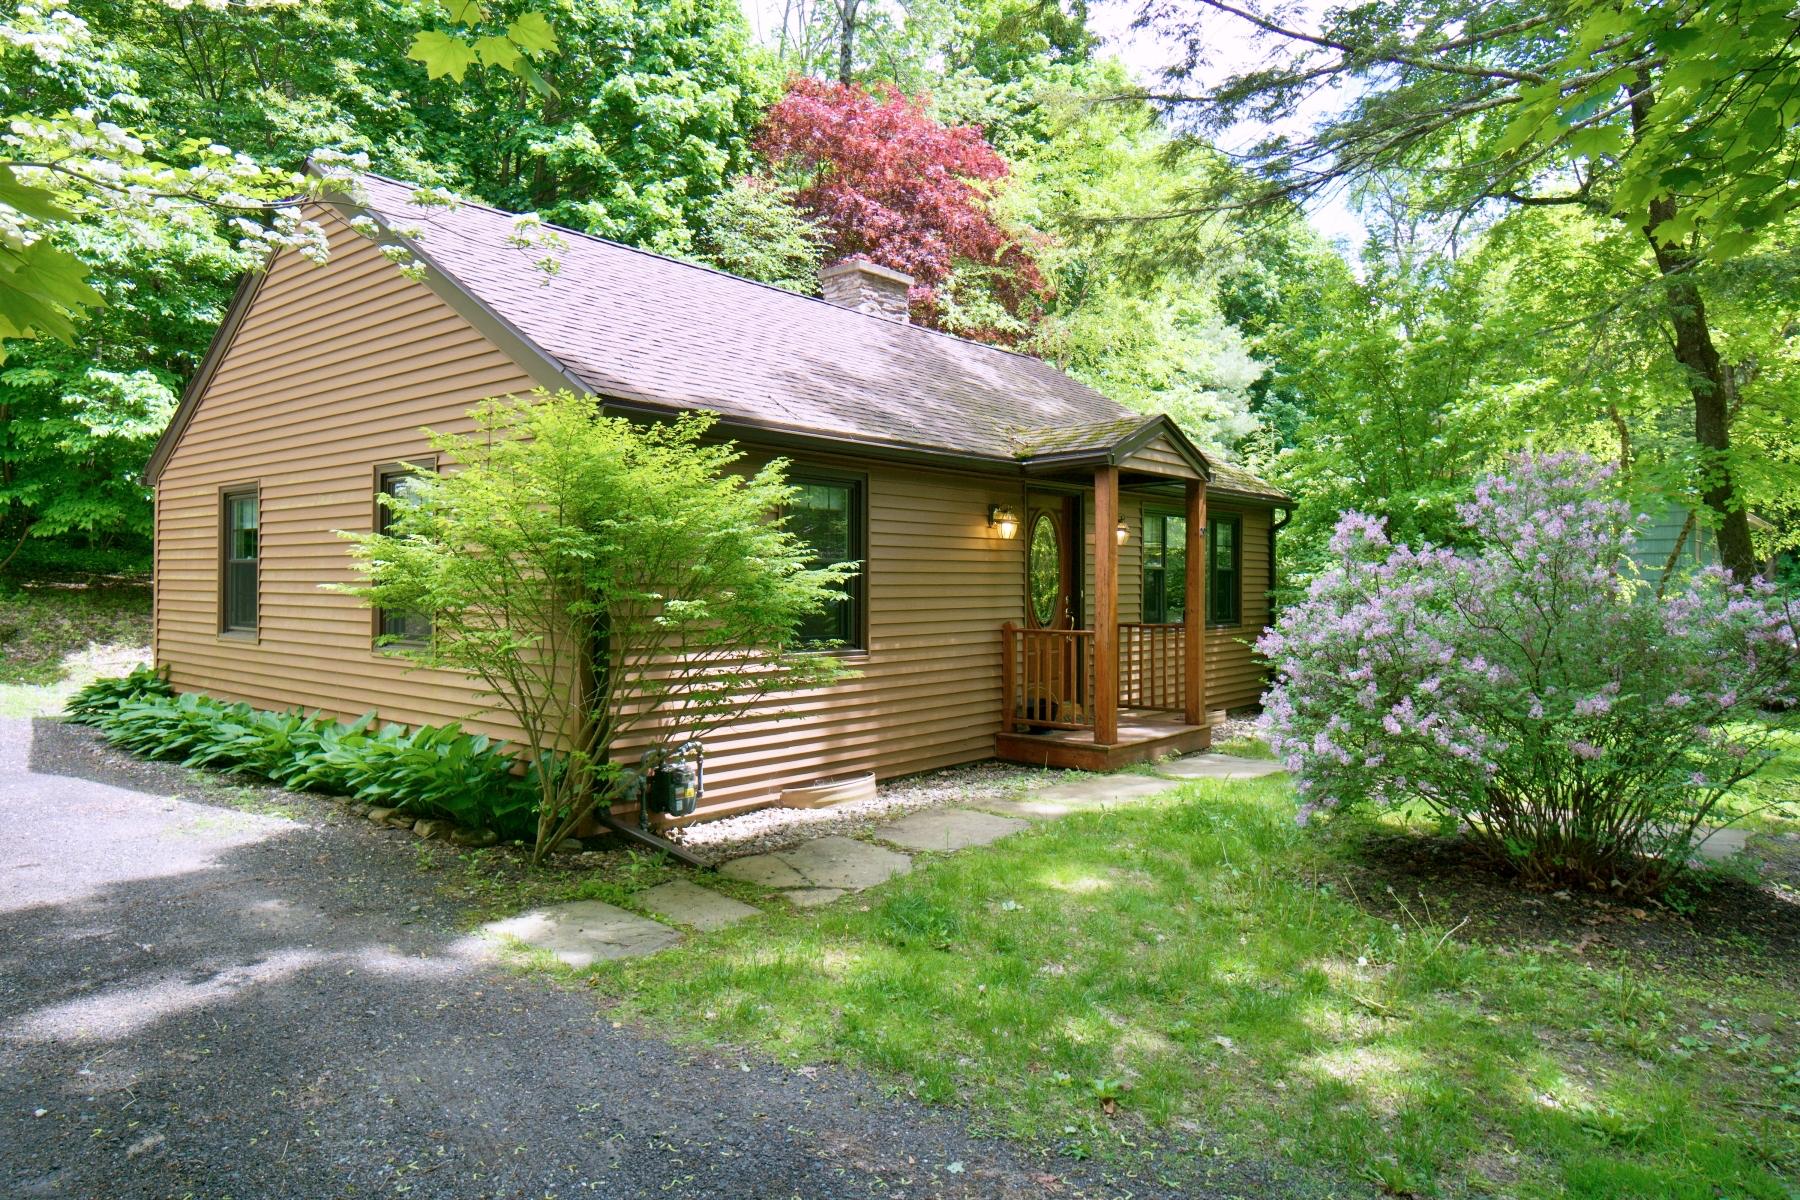 Single Family Homes για την Πώληση στο Condo Style Living in Your Own Home 29 Kemble St, Lenox, Μασαχουσετη 01240 Ηνωμένες Πολιτείες